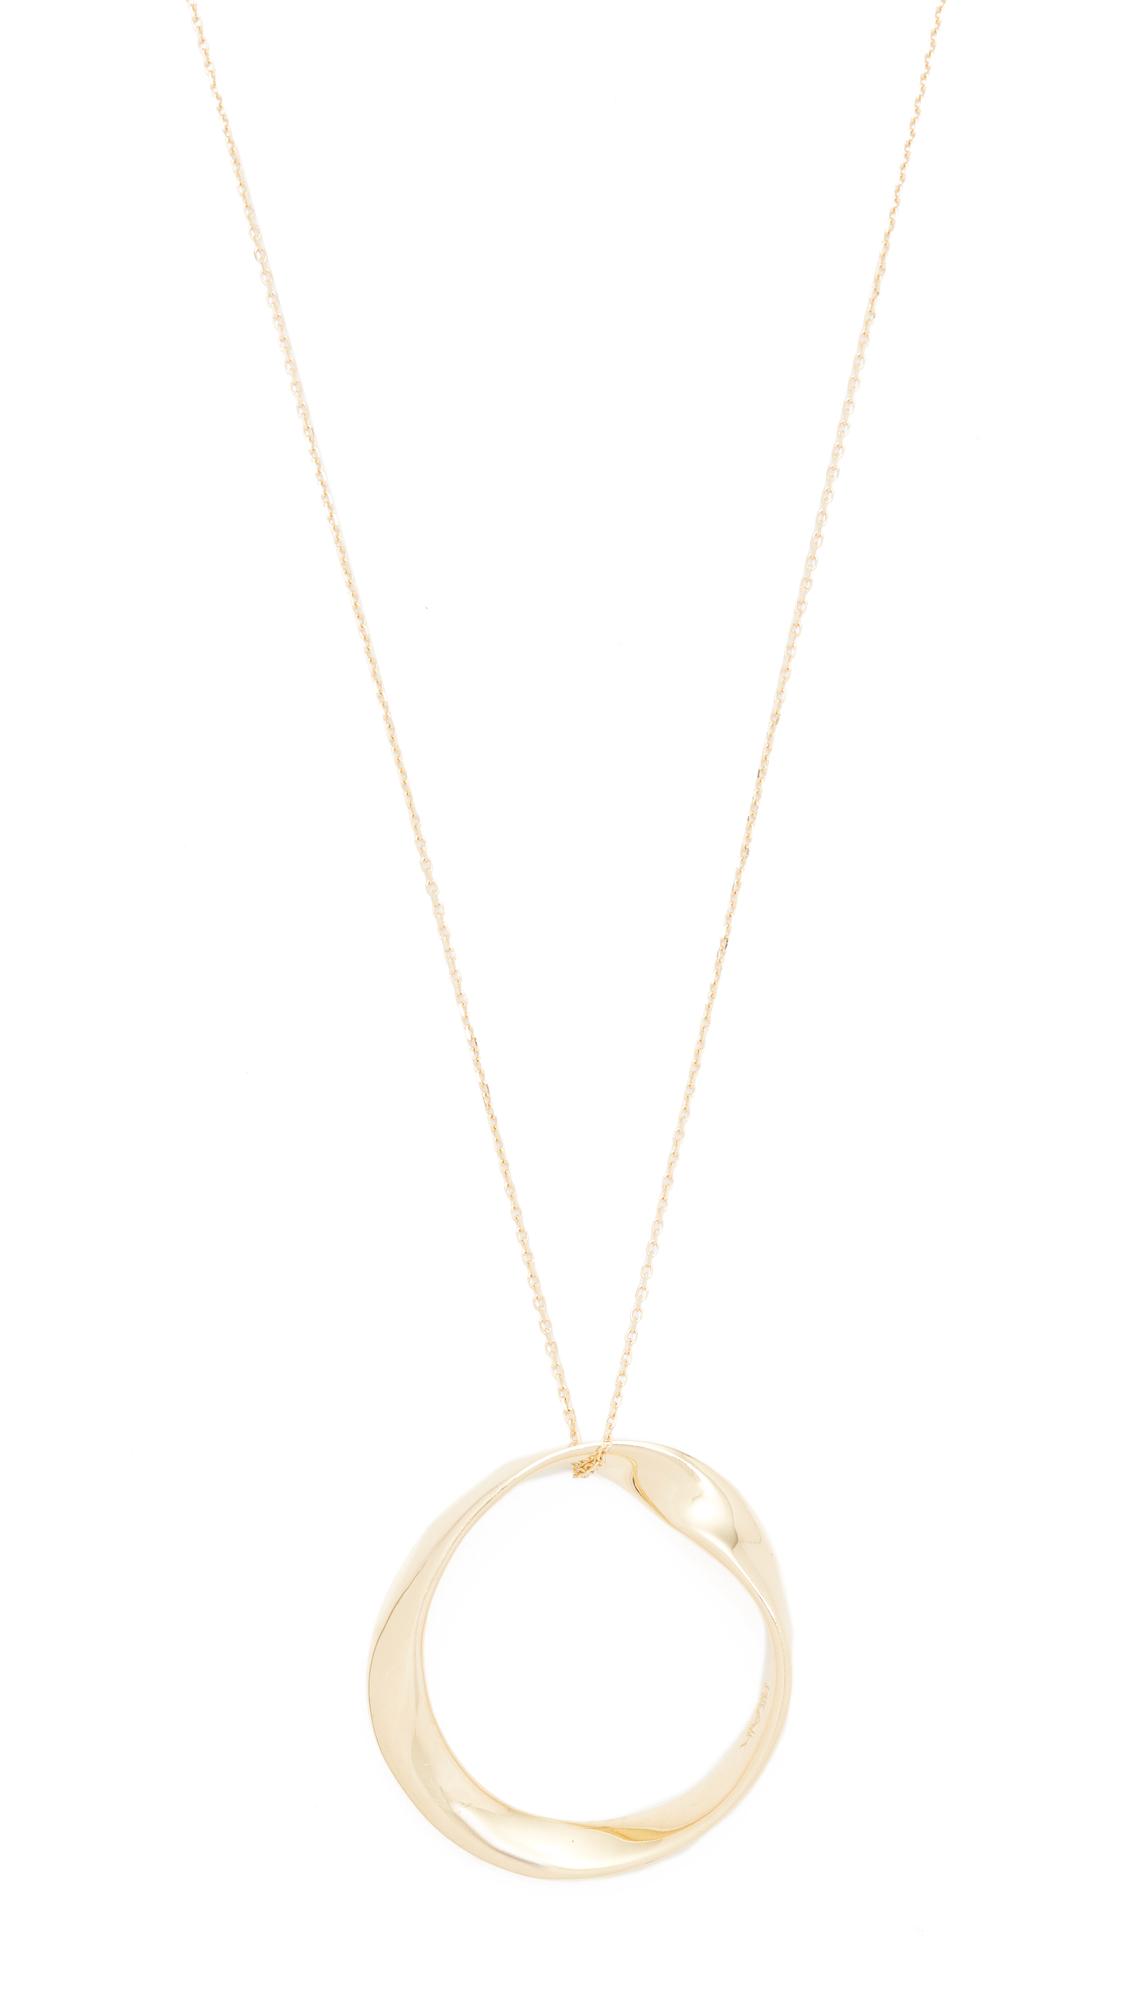 Adina Reyter 14k Gold Large Twist Circle Necklace - Gold